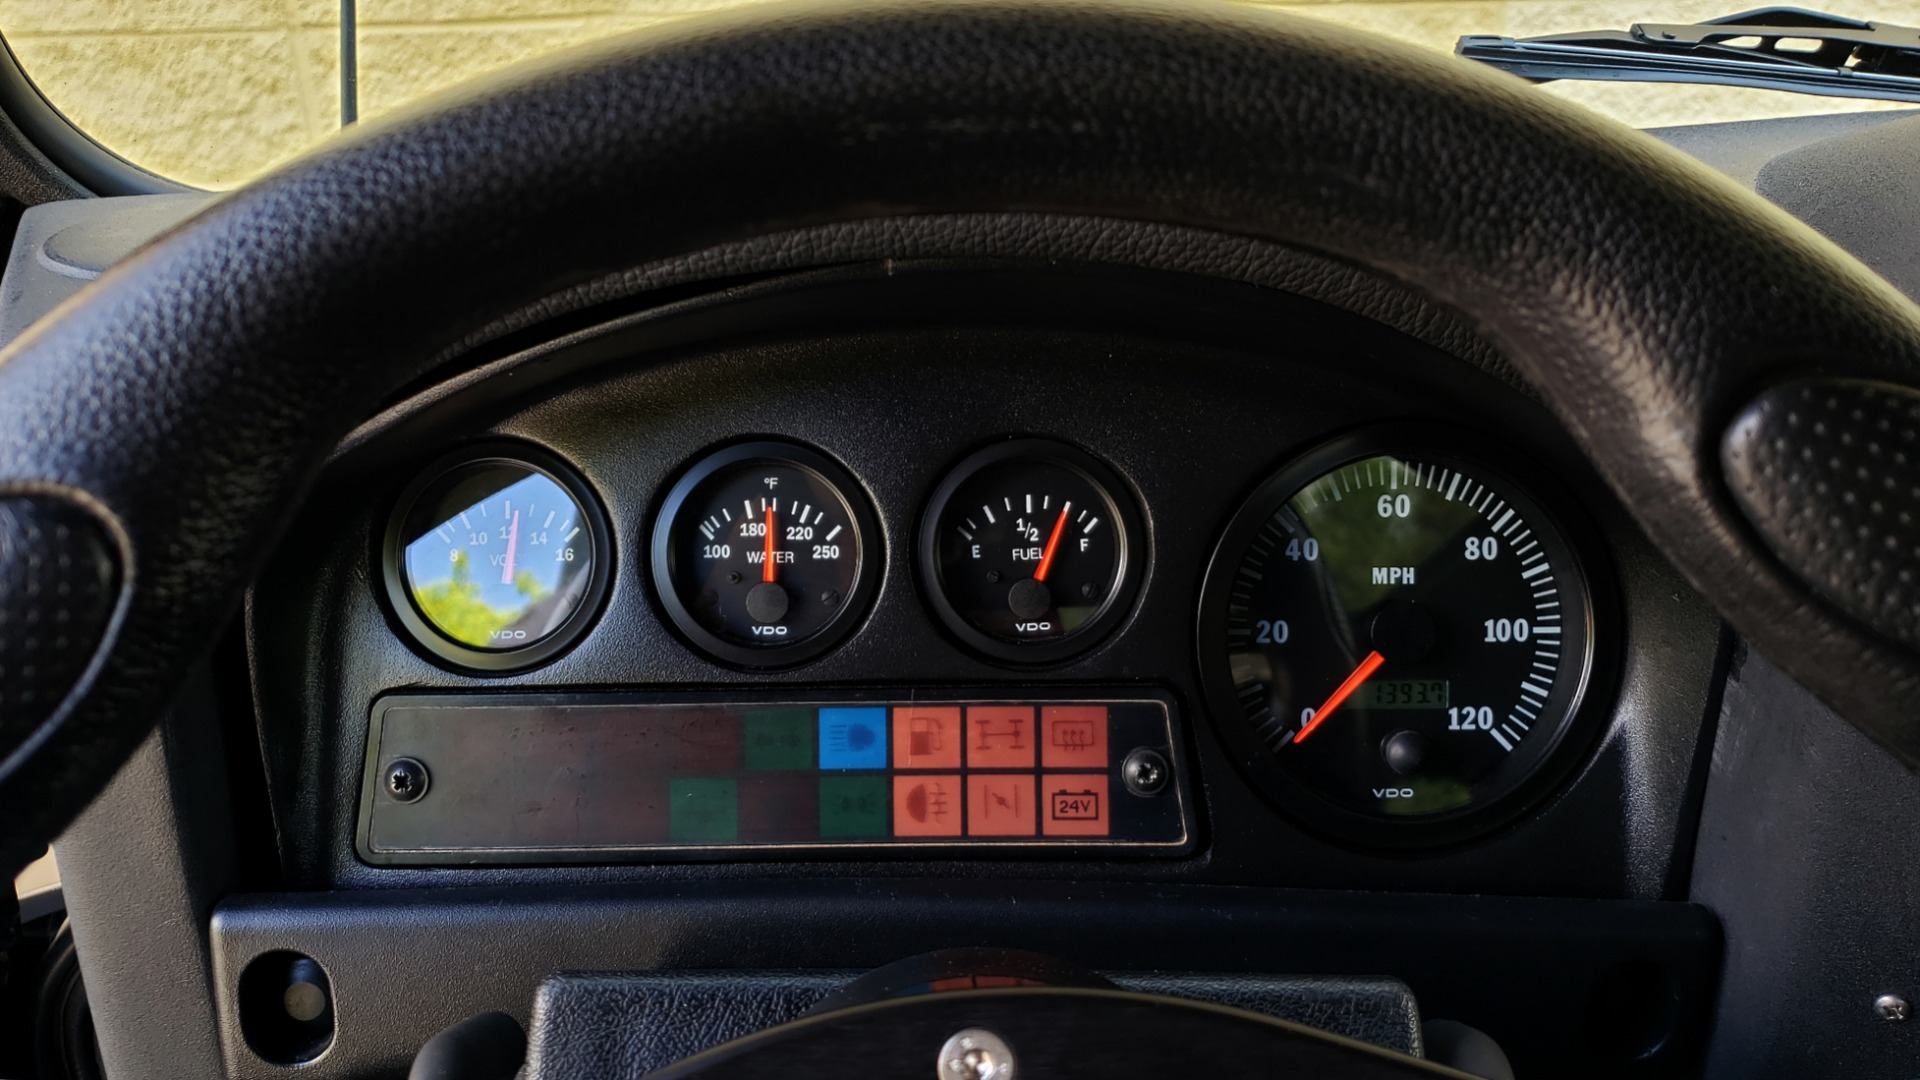 Used 1985 Land Rover DEFENDER 90 4X4 CUSTOM RESTORED 5.3L LS V8 for sale Sold at Formula Imports in Charlotte NC 28227 32